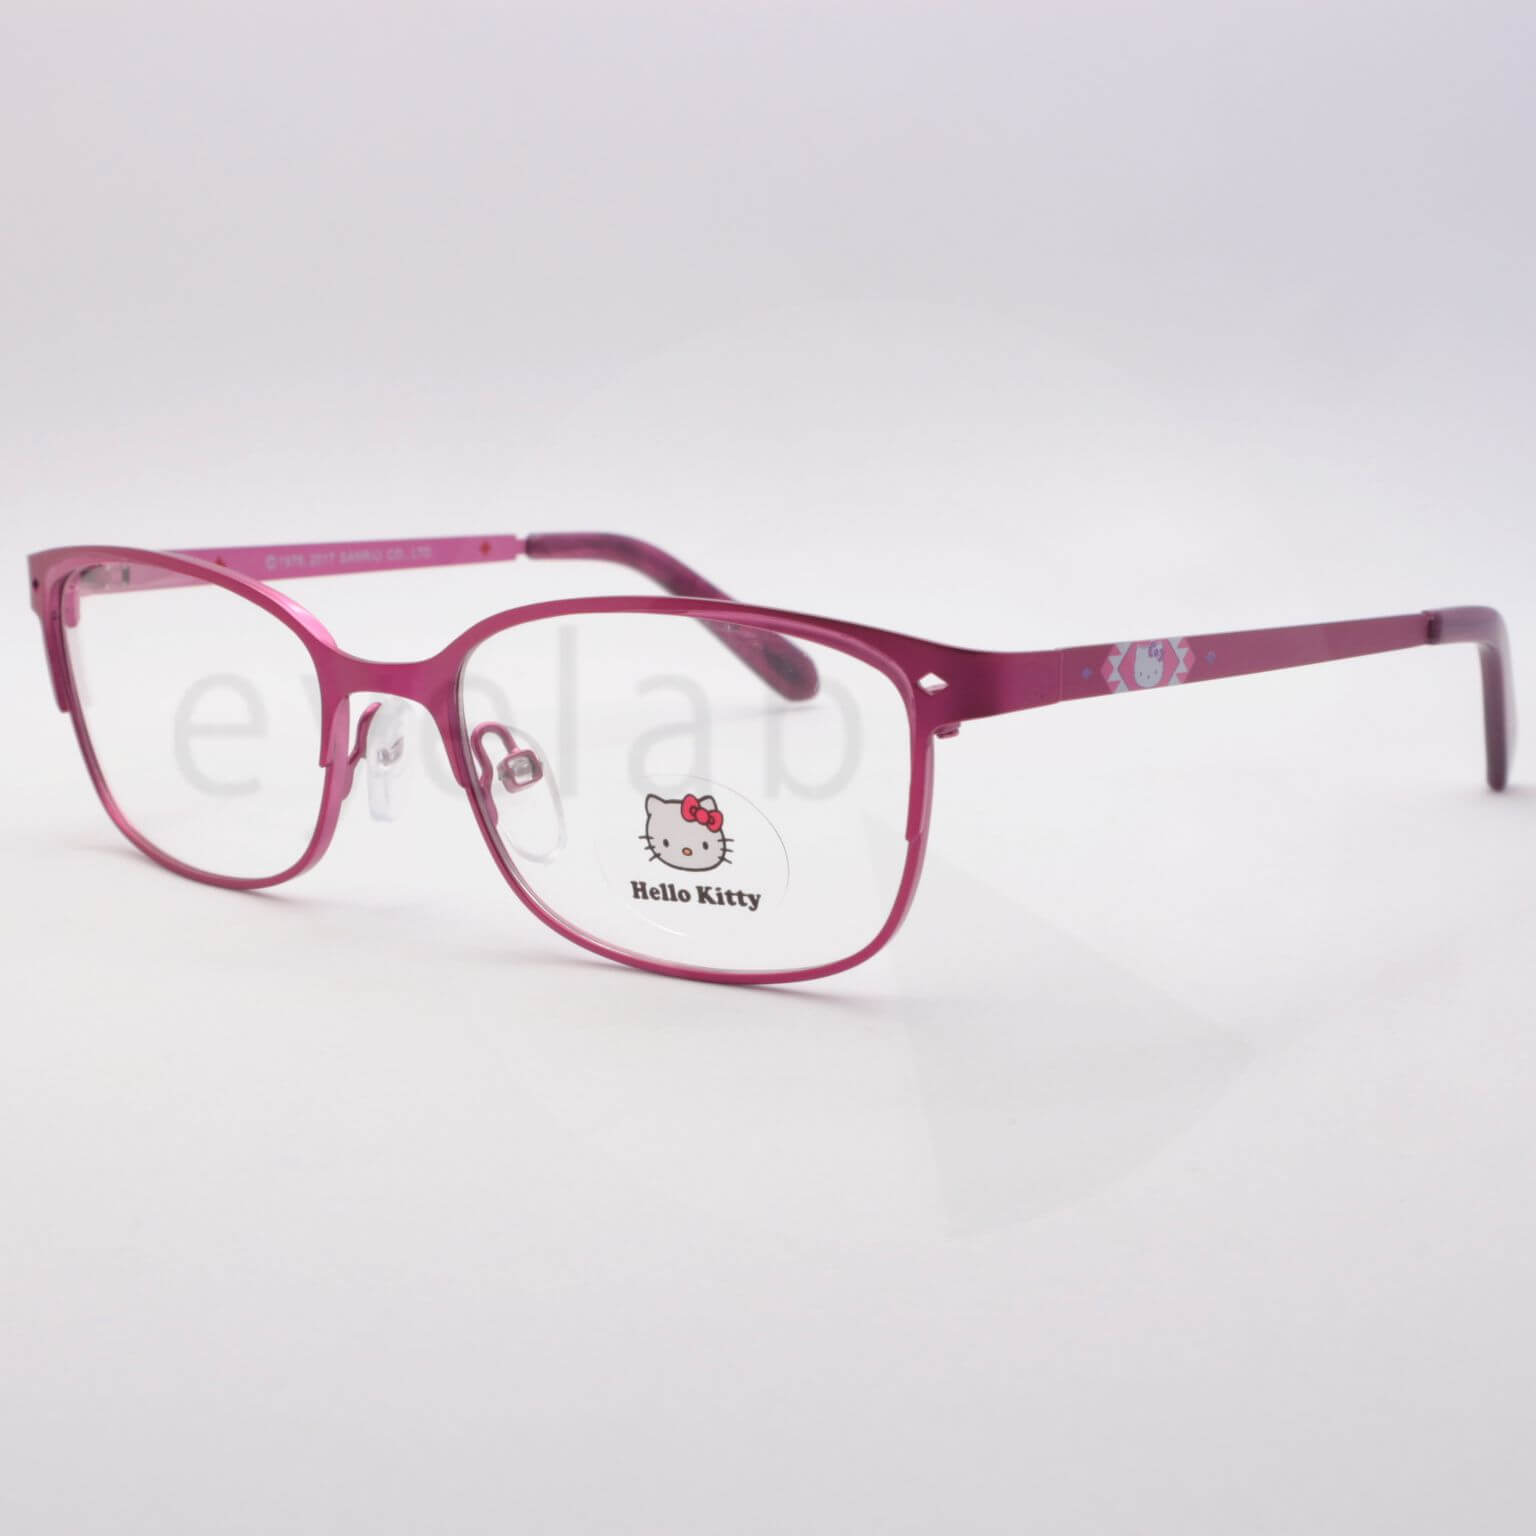 3db00bf46a Παιδικά γυαλιά οράσεως Hello Kitty MM062 C12 ~ Eyelab